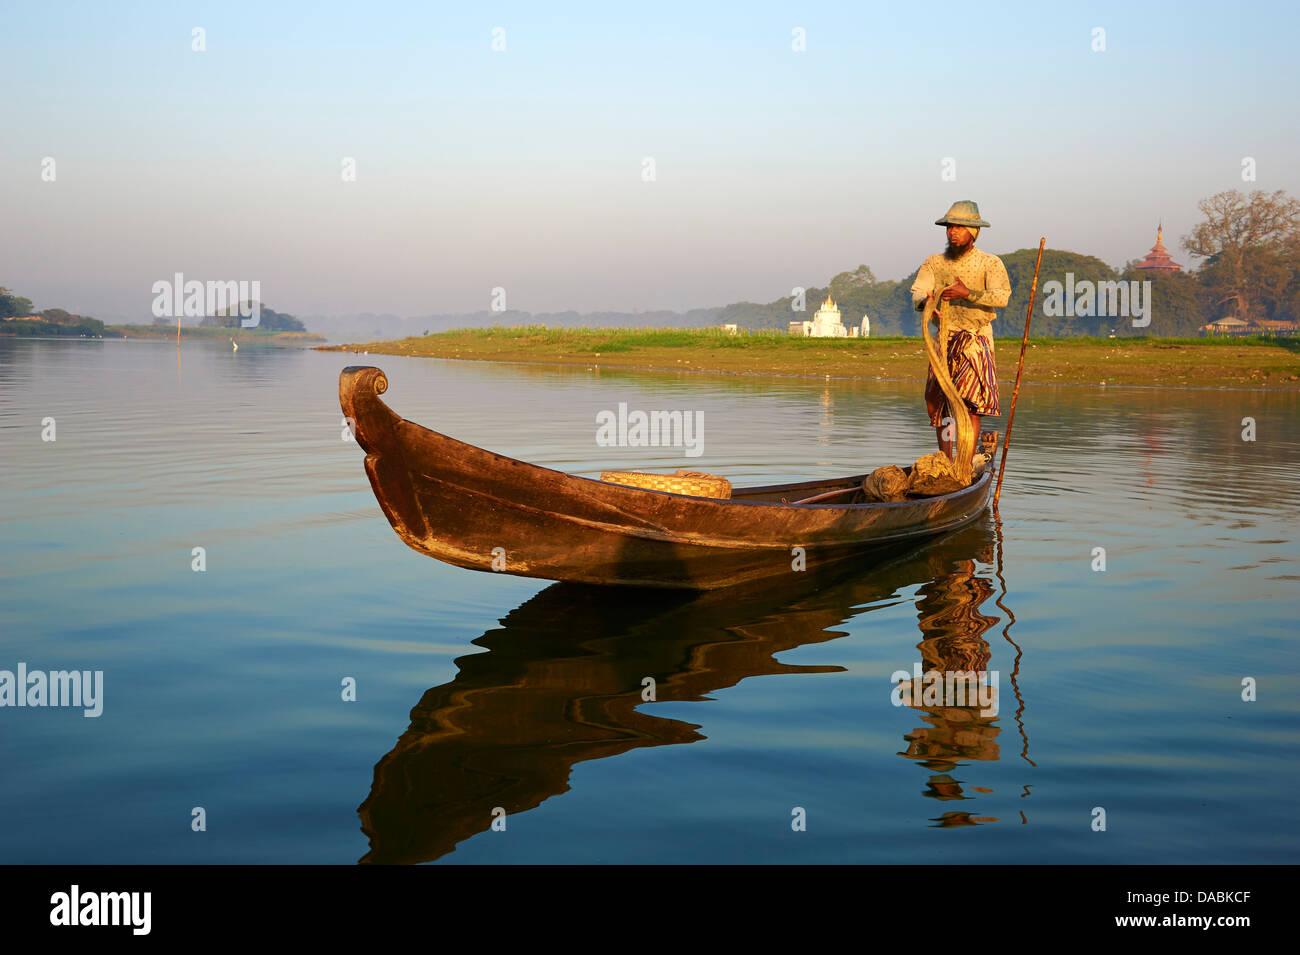 Pescatore sul Taung Thama lago, Amarapura, Mandalay Myanmar (Birmania), Asia Immagini Stock